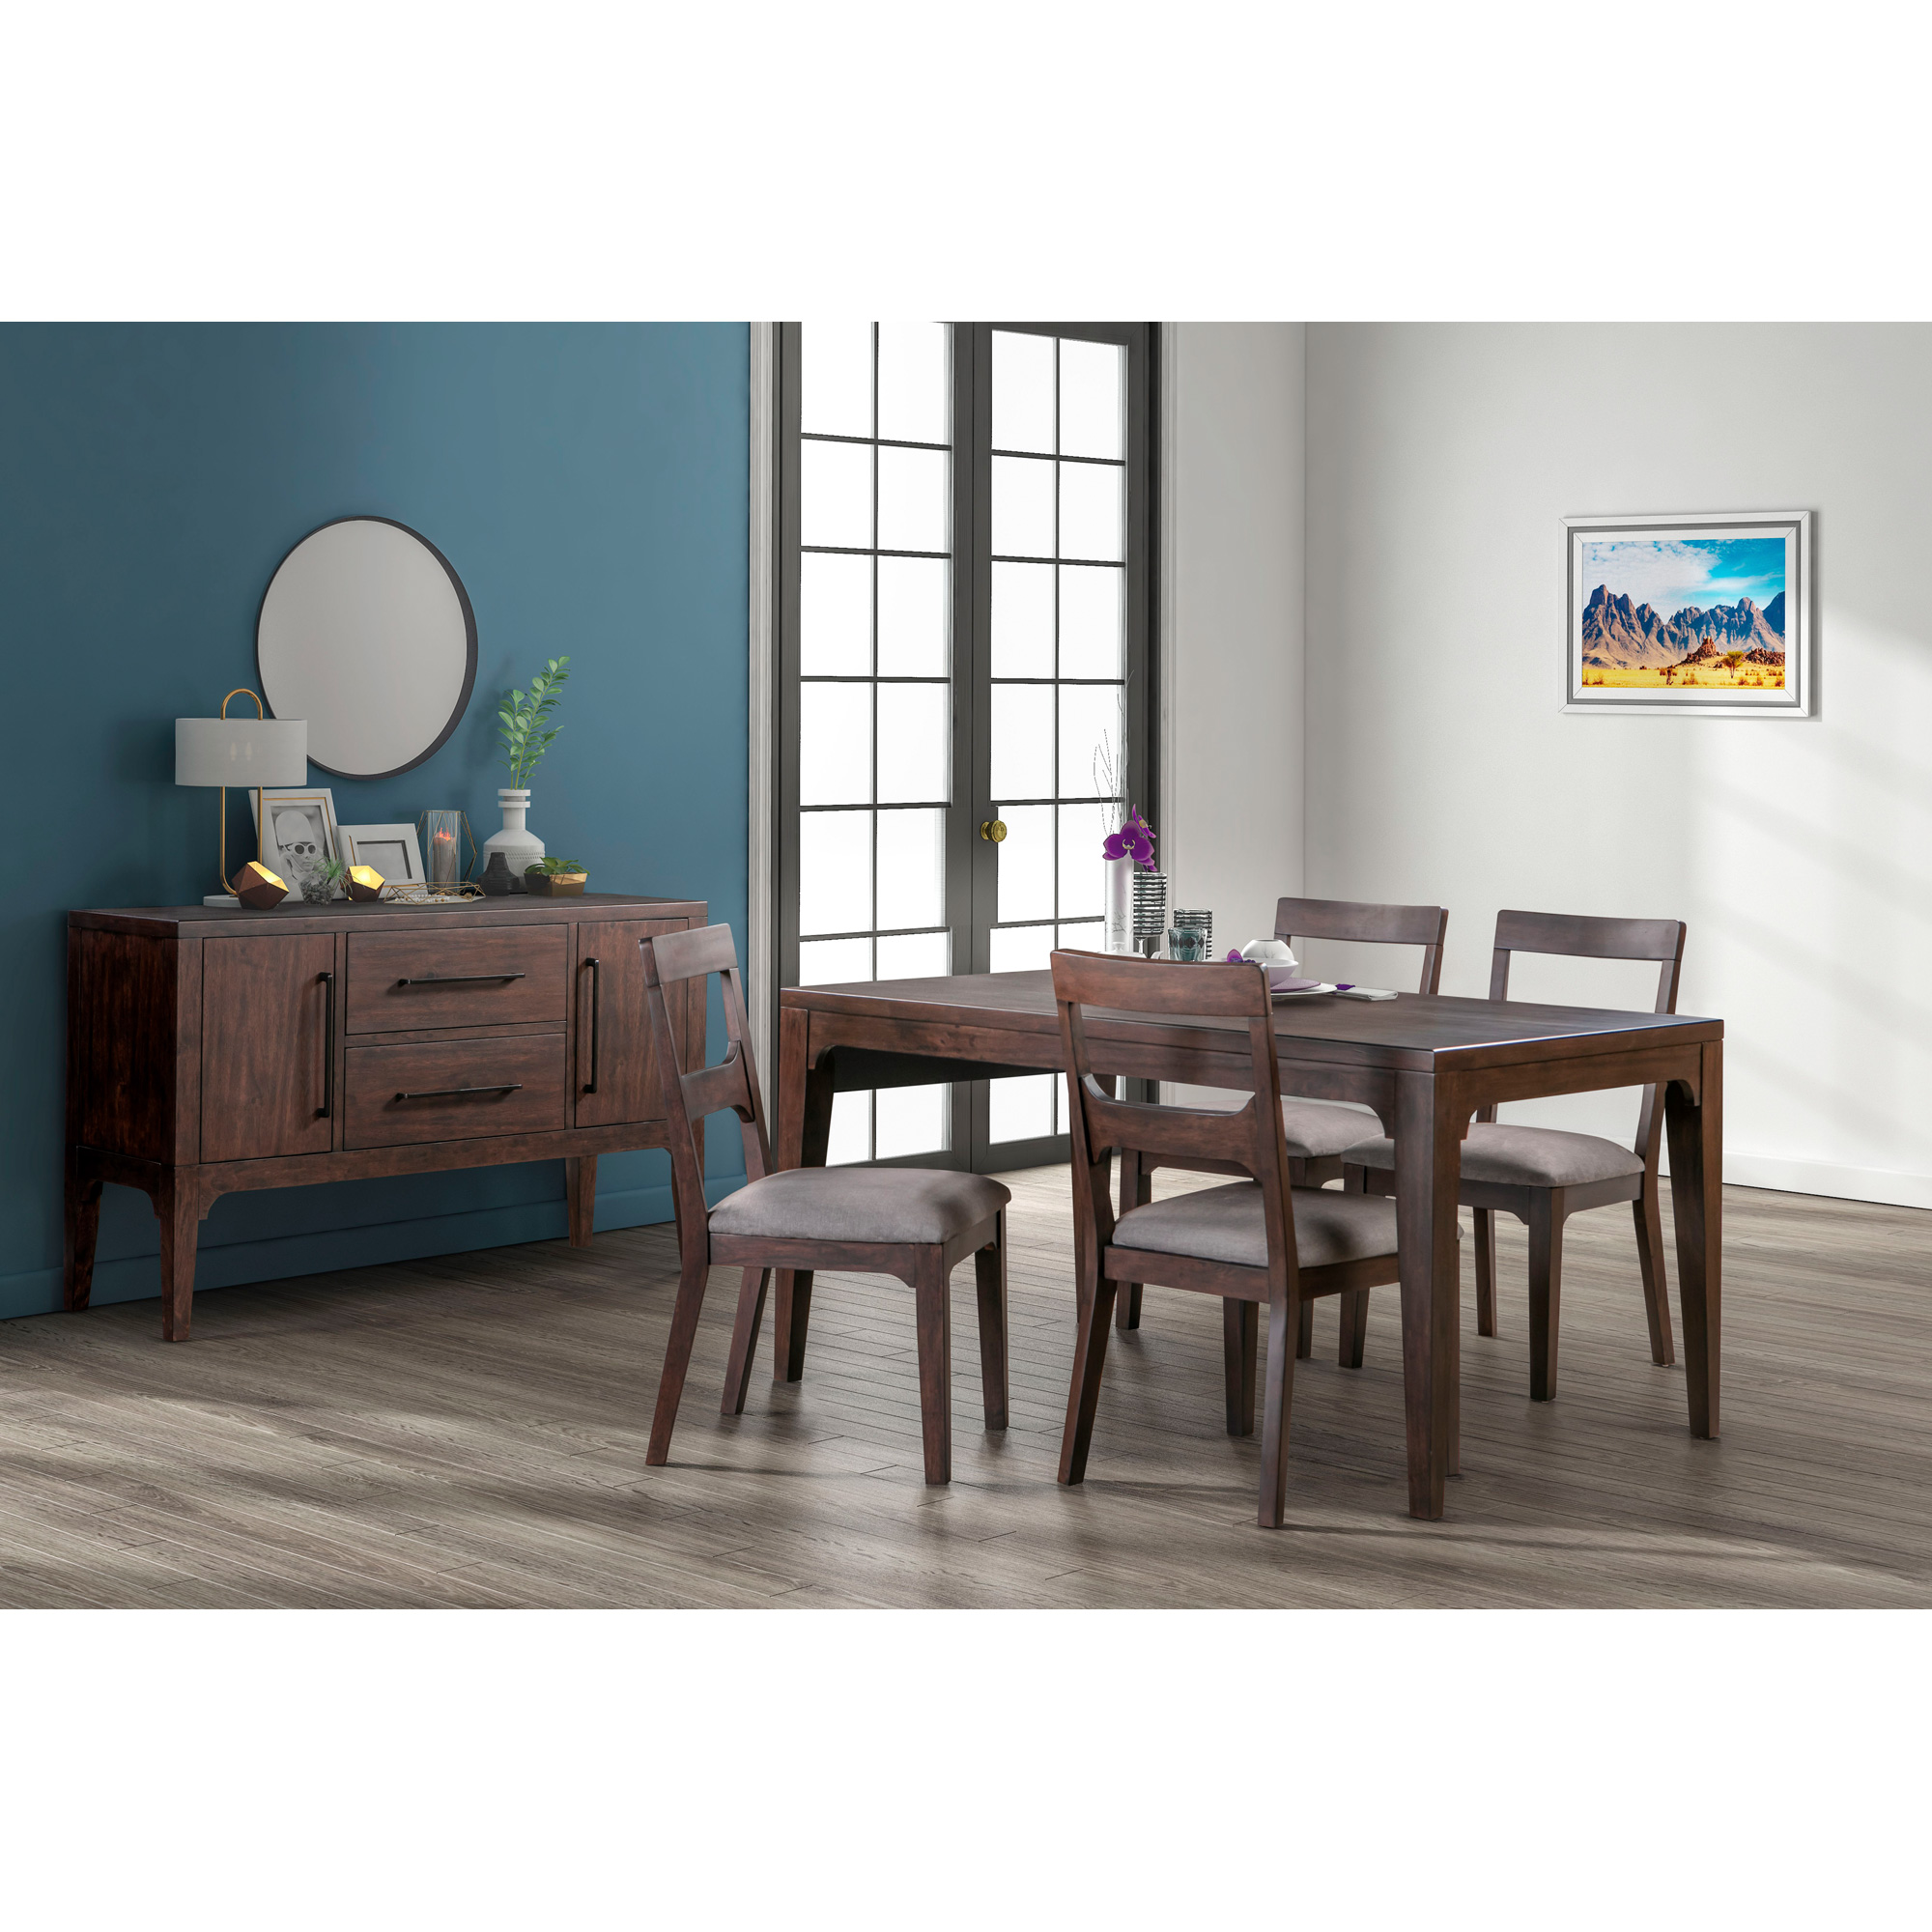 Modus Furniture International | Bryce Brown Horse 5 Piece Dining Set